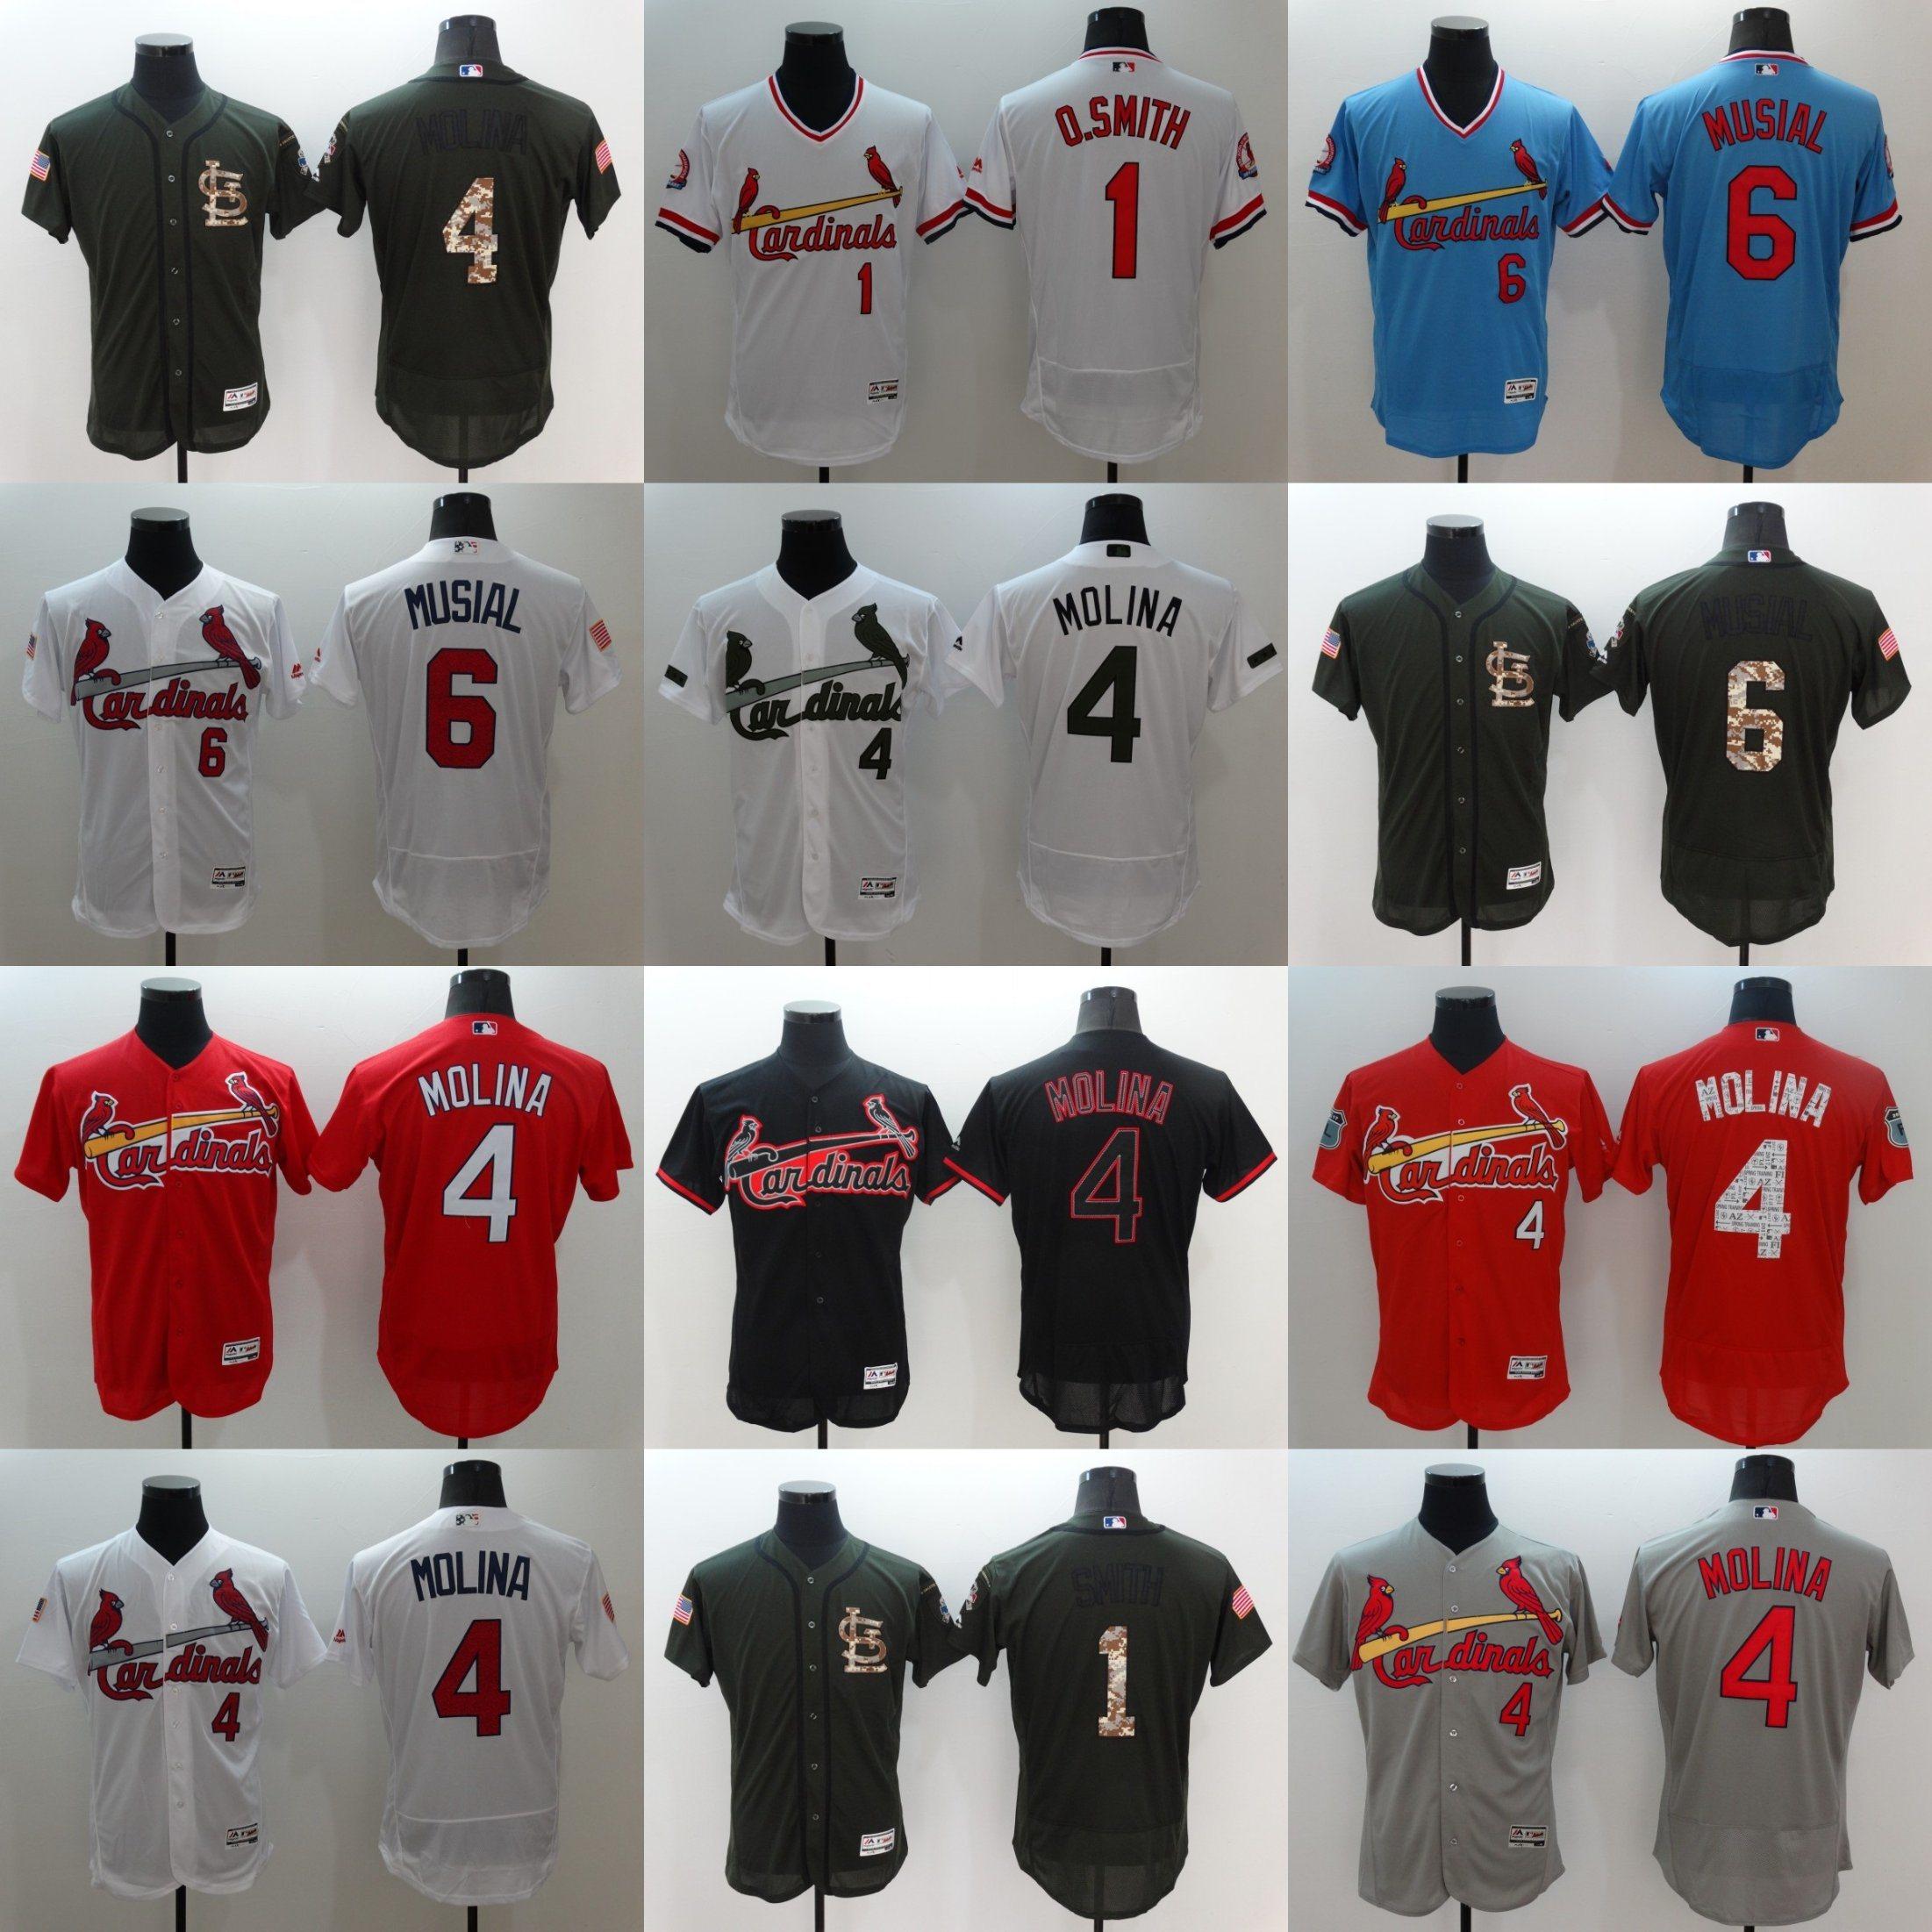 free shipping 2142b c36e8 [Hot Item] Customized St. Louis Cardinals Molina Baseball Jerseys